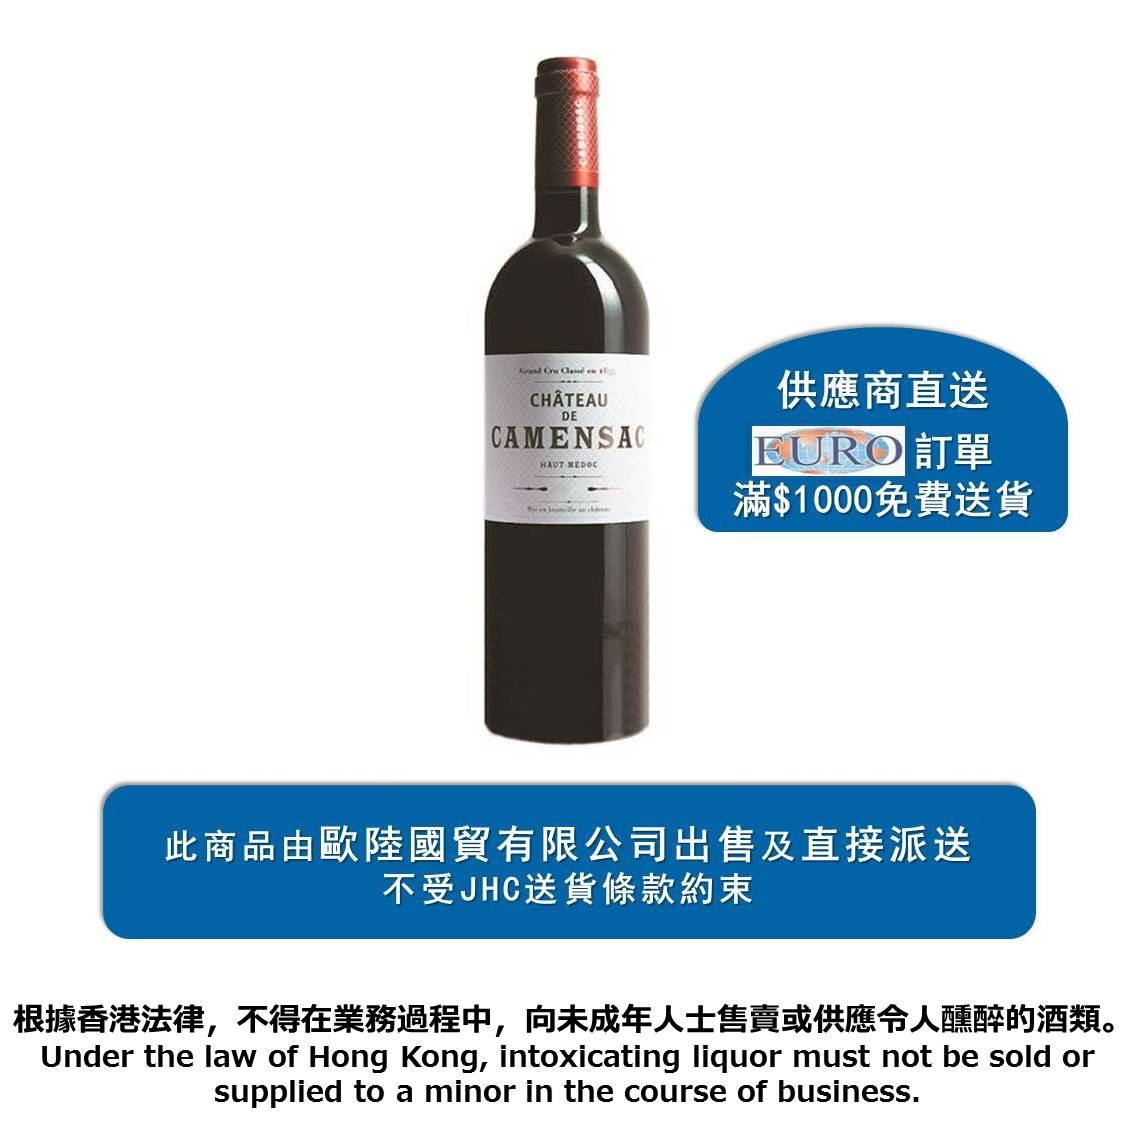 CHATEAU DE CAMENSAC葡萄酒 2014